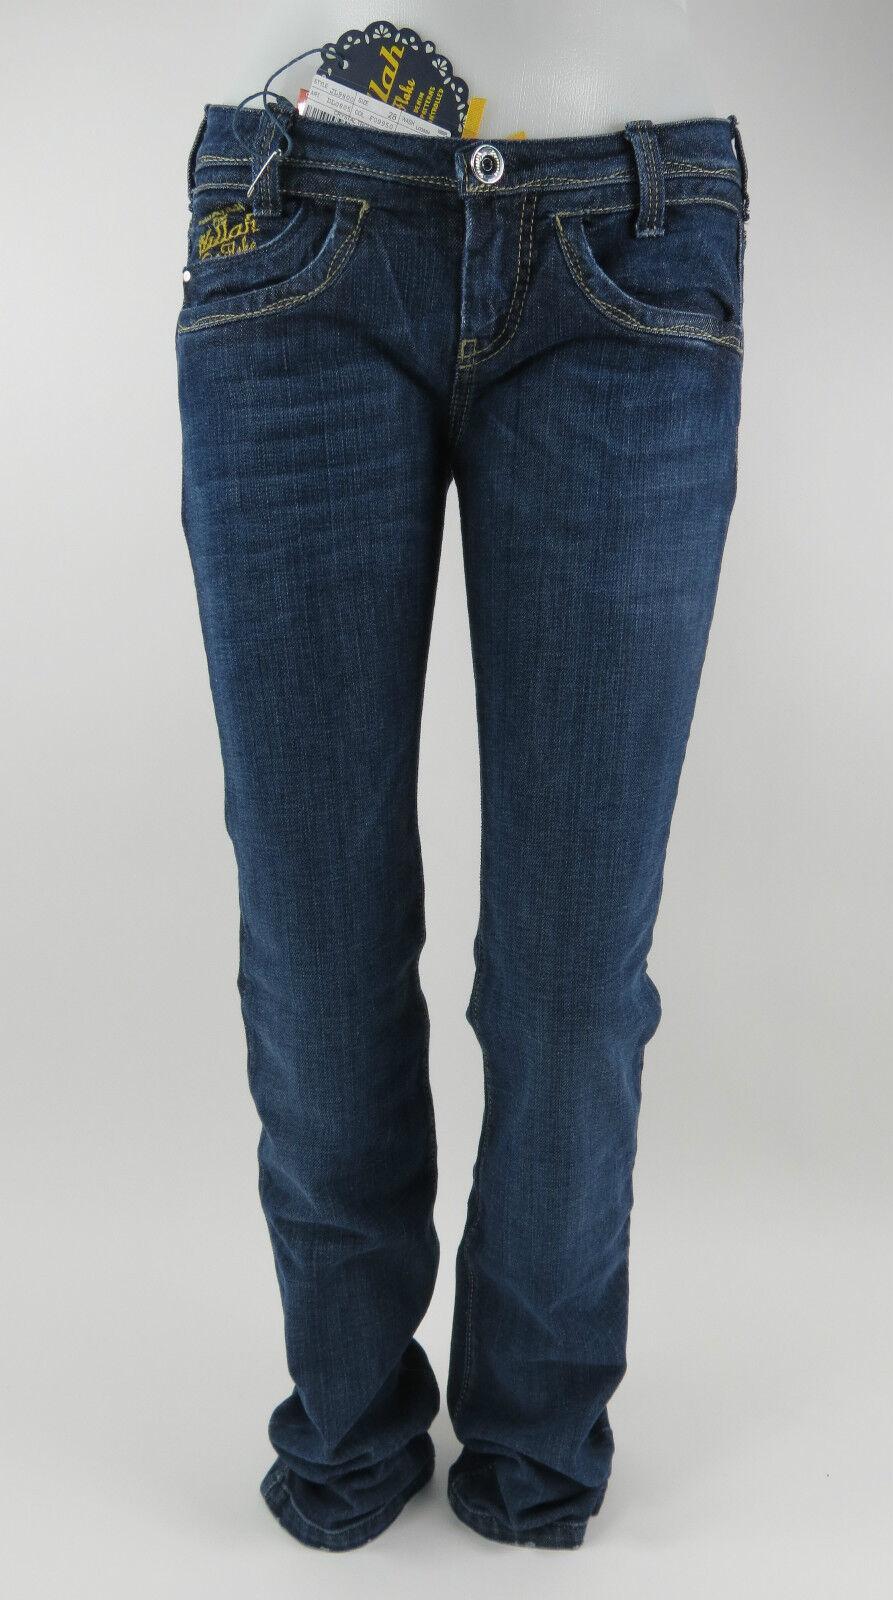 Killah Jeans CRYSTAL TROUSERS (BASIC) DL0805 JL9800 L00884 +NEU+